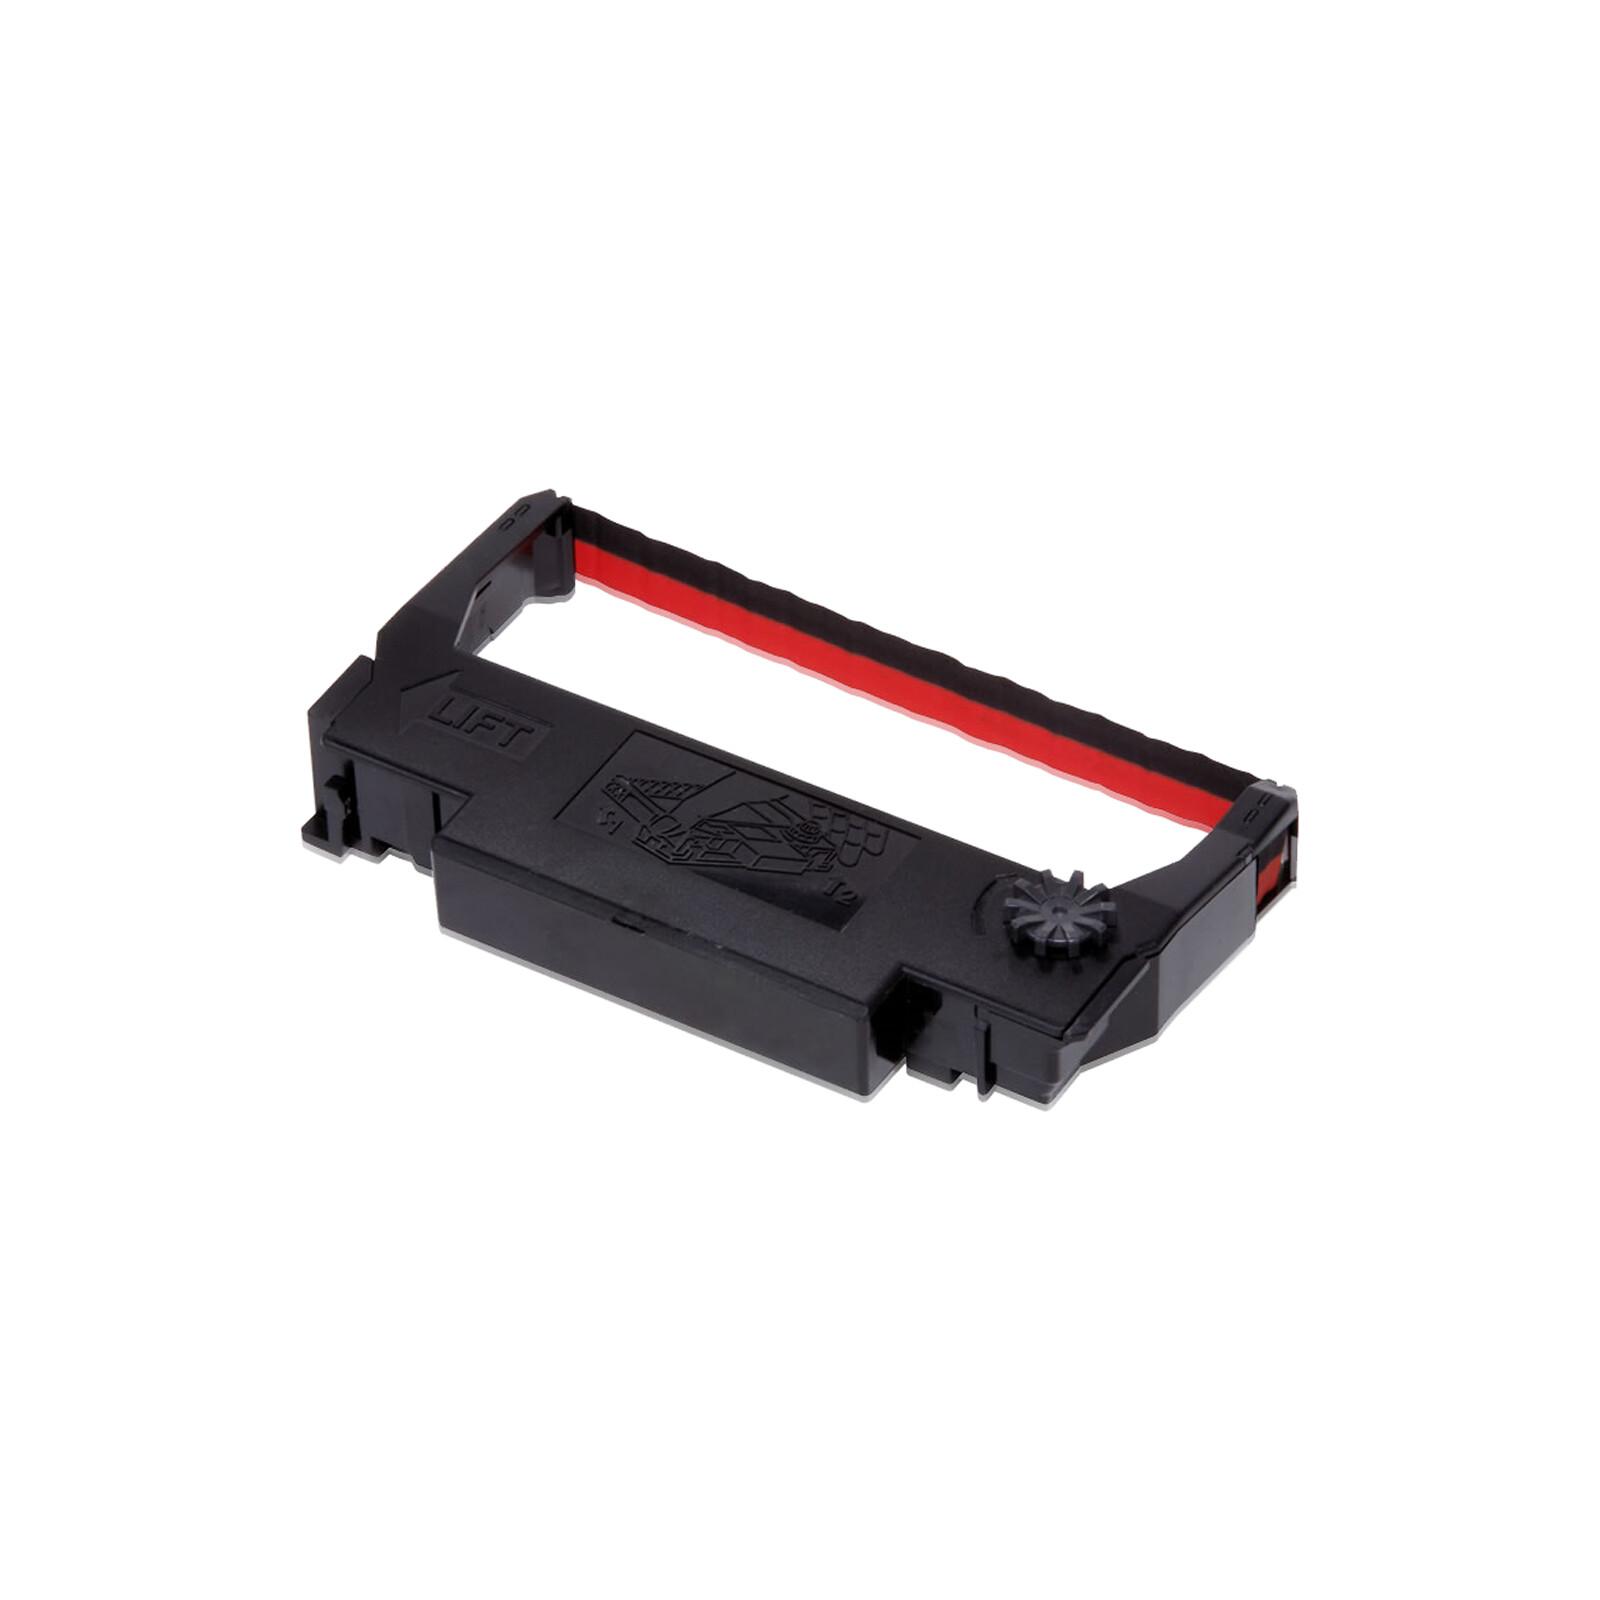 Epson 655 S015376 black/red